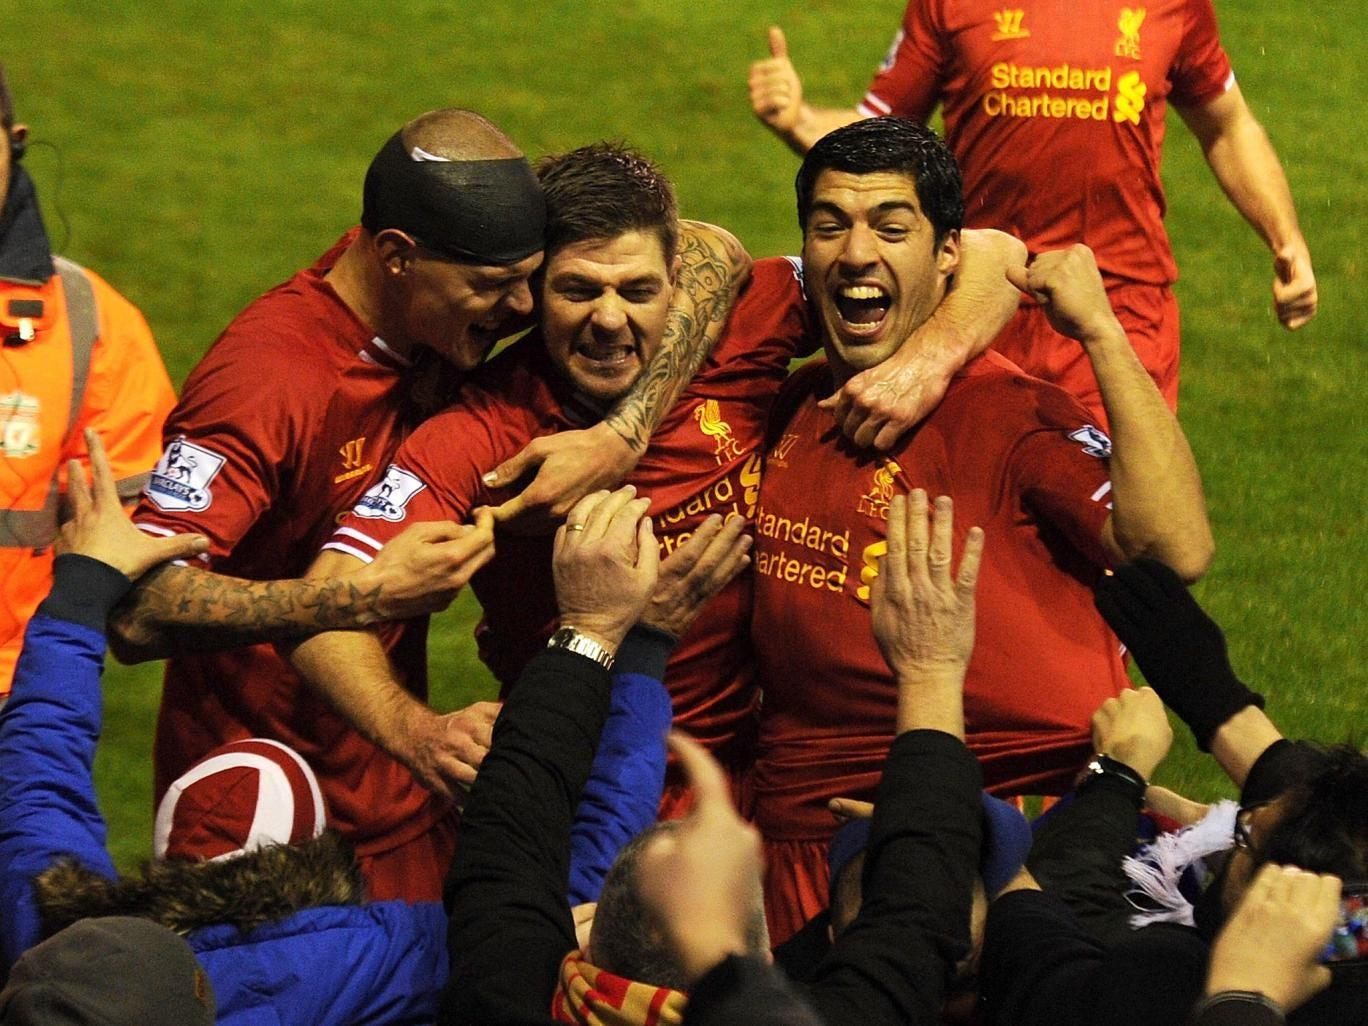 Steven Gerrard of Liverpool celebrates his goal with Martin Skrtel and Luis Suarez